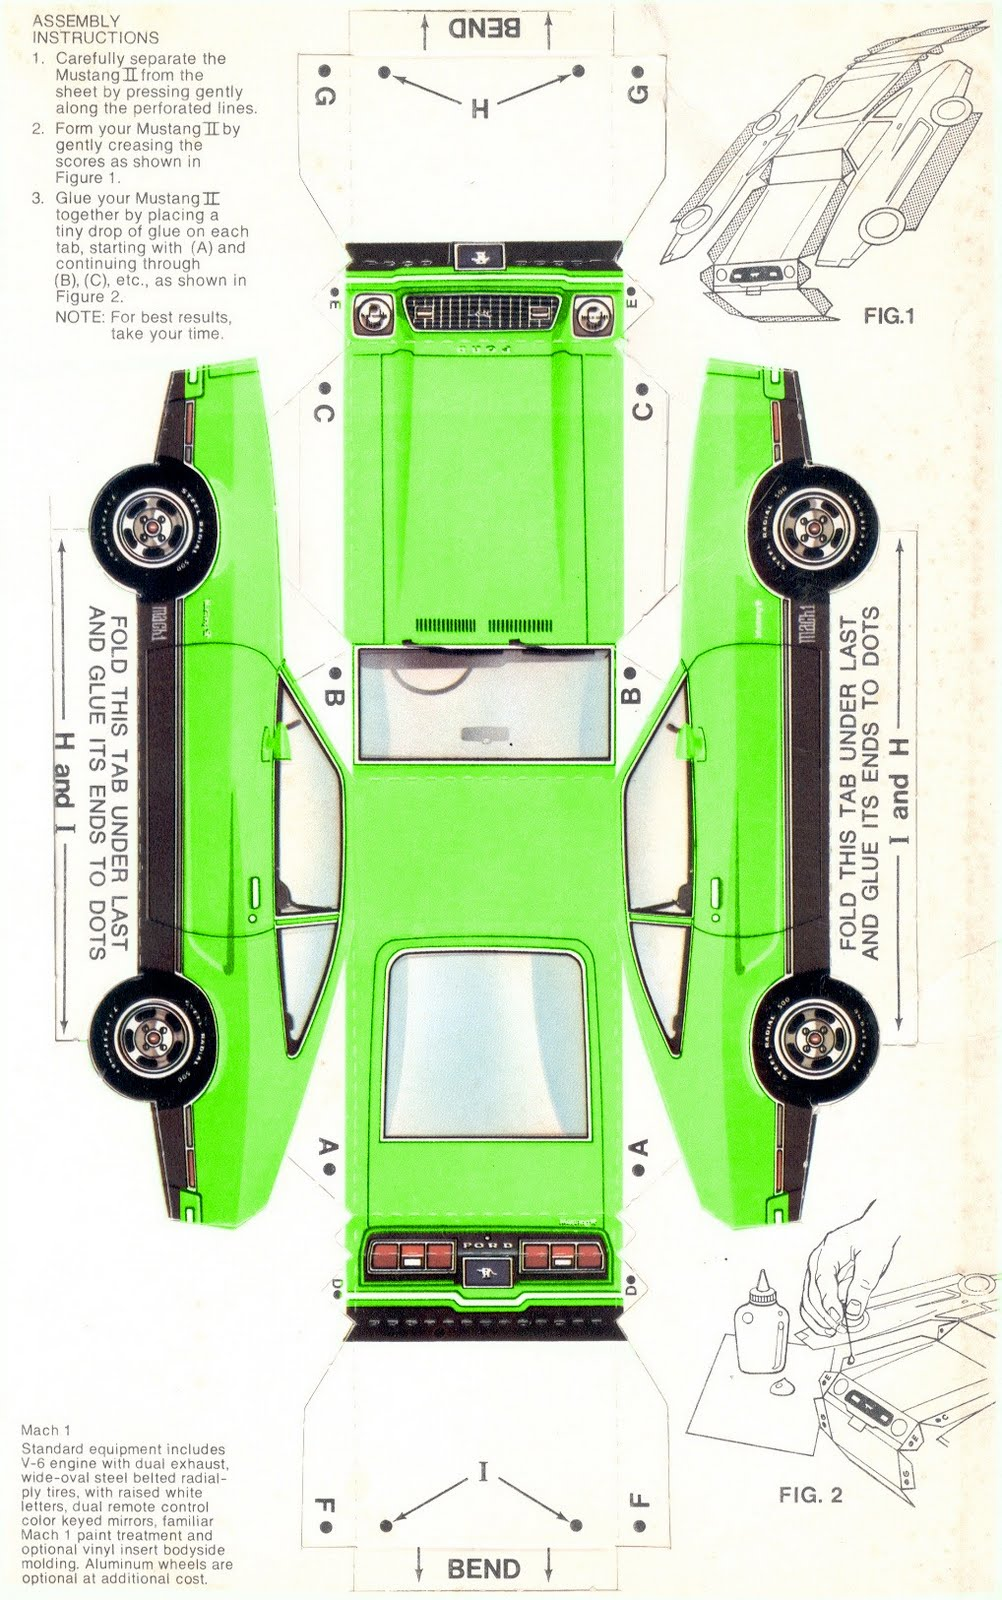 Green B Bmach B Bpaper Bcar Bmustang Bii Bhatchback Bpromotional Bsales Bbrochure on 1989 Jeep Wrangler Sales Brochure